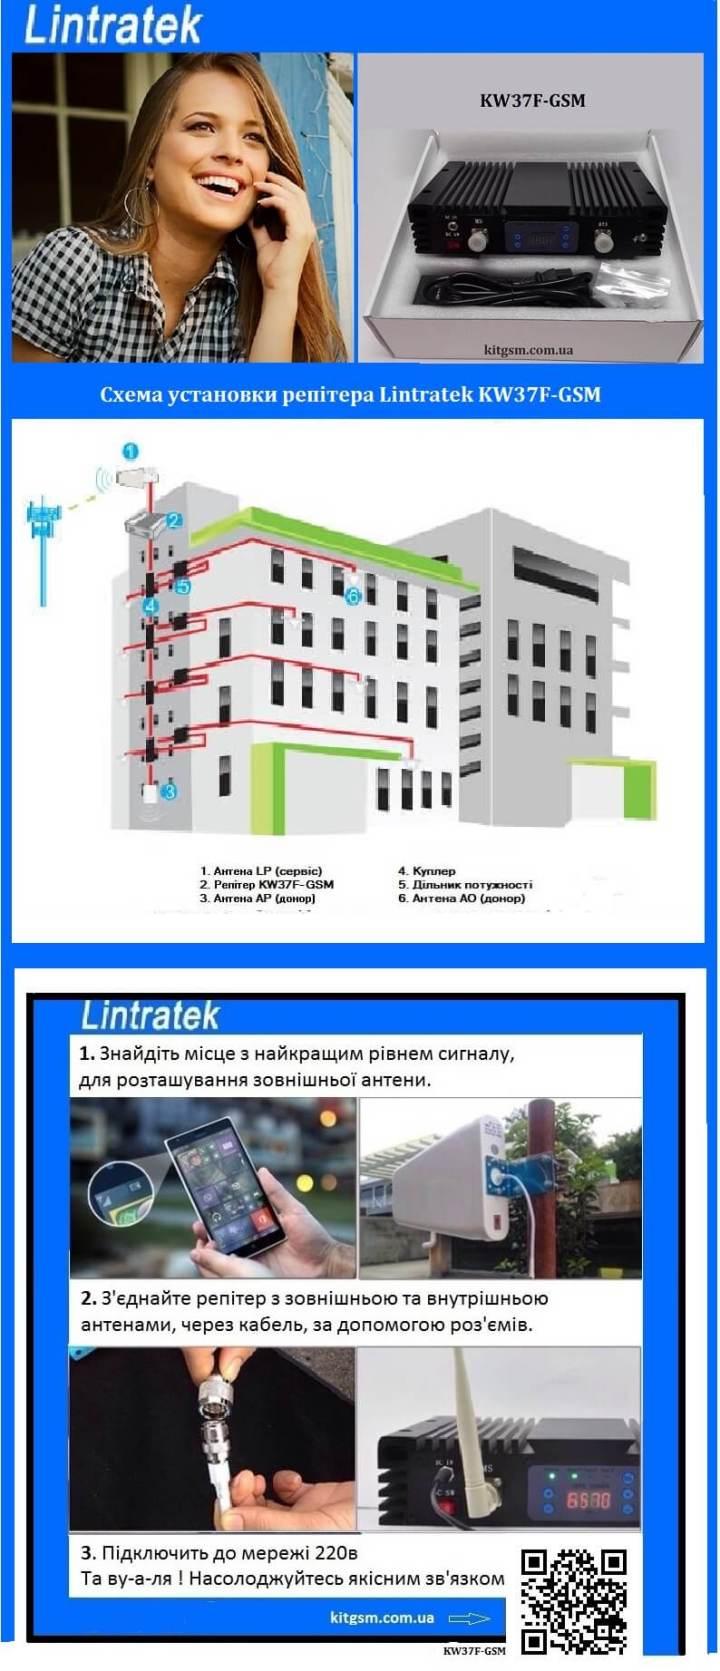 Lintratek-KW37F-GSM